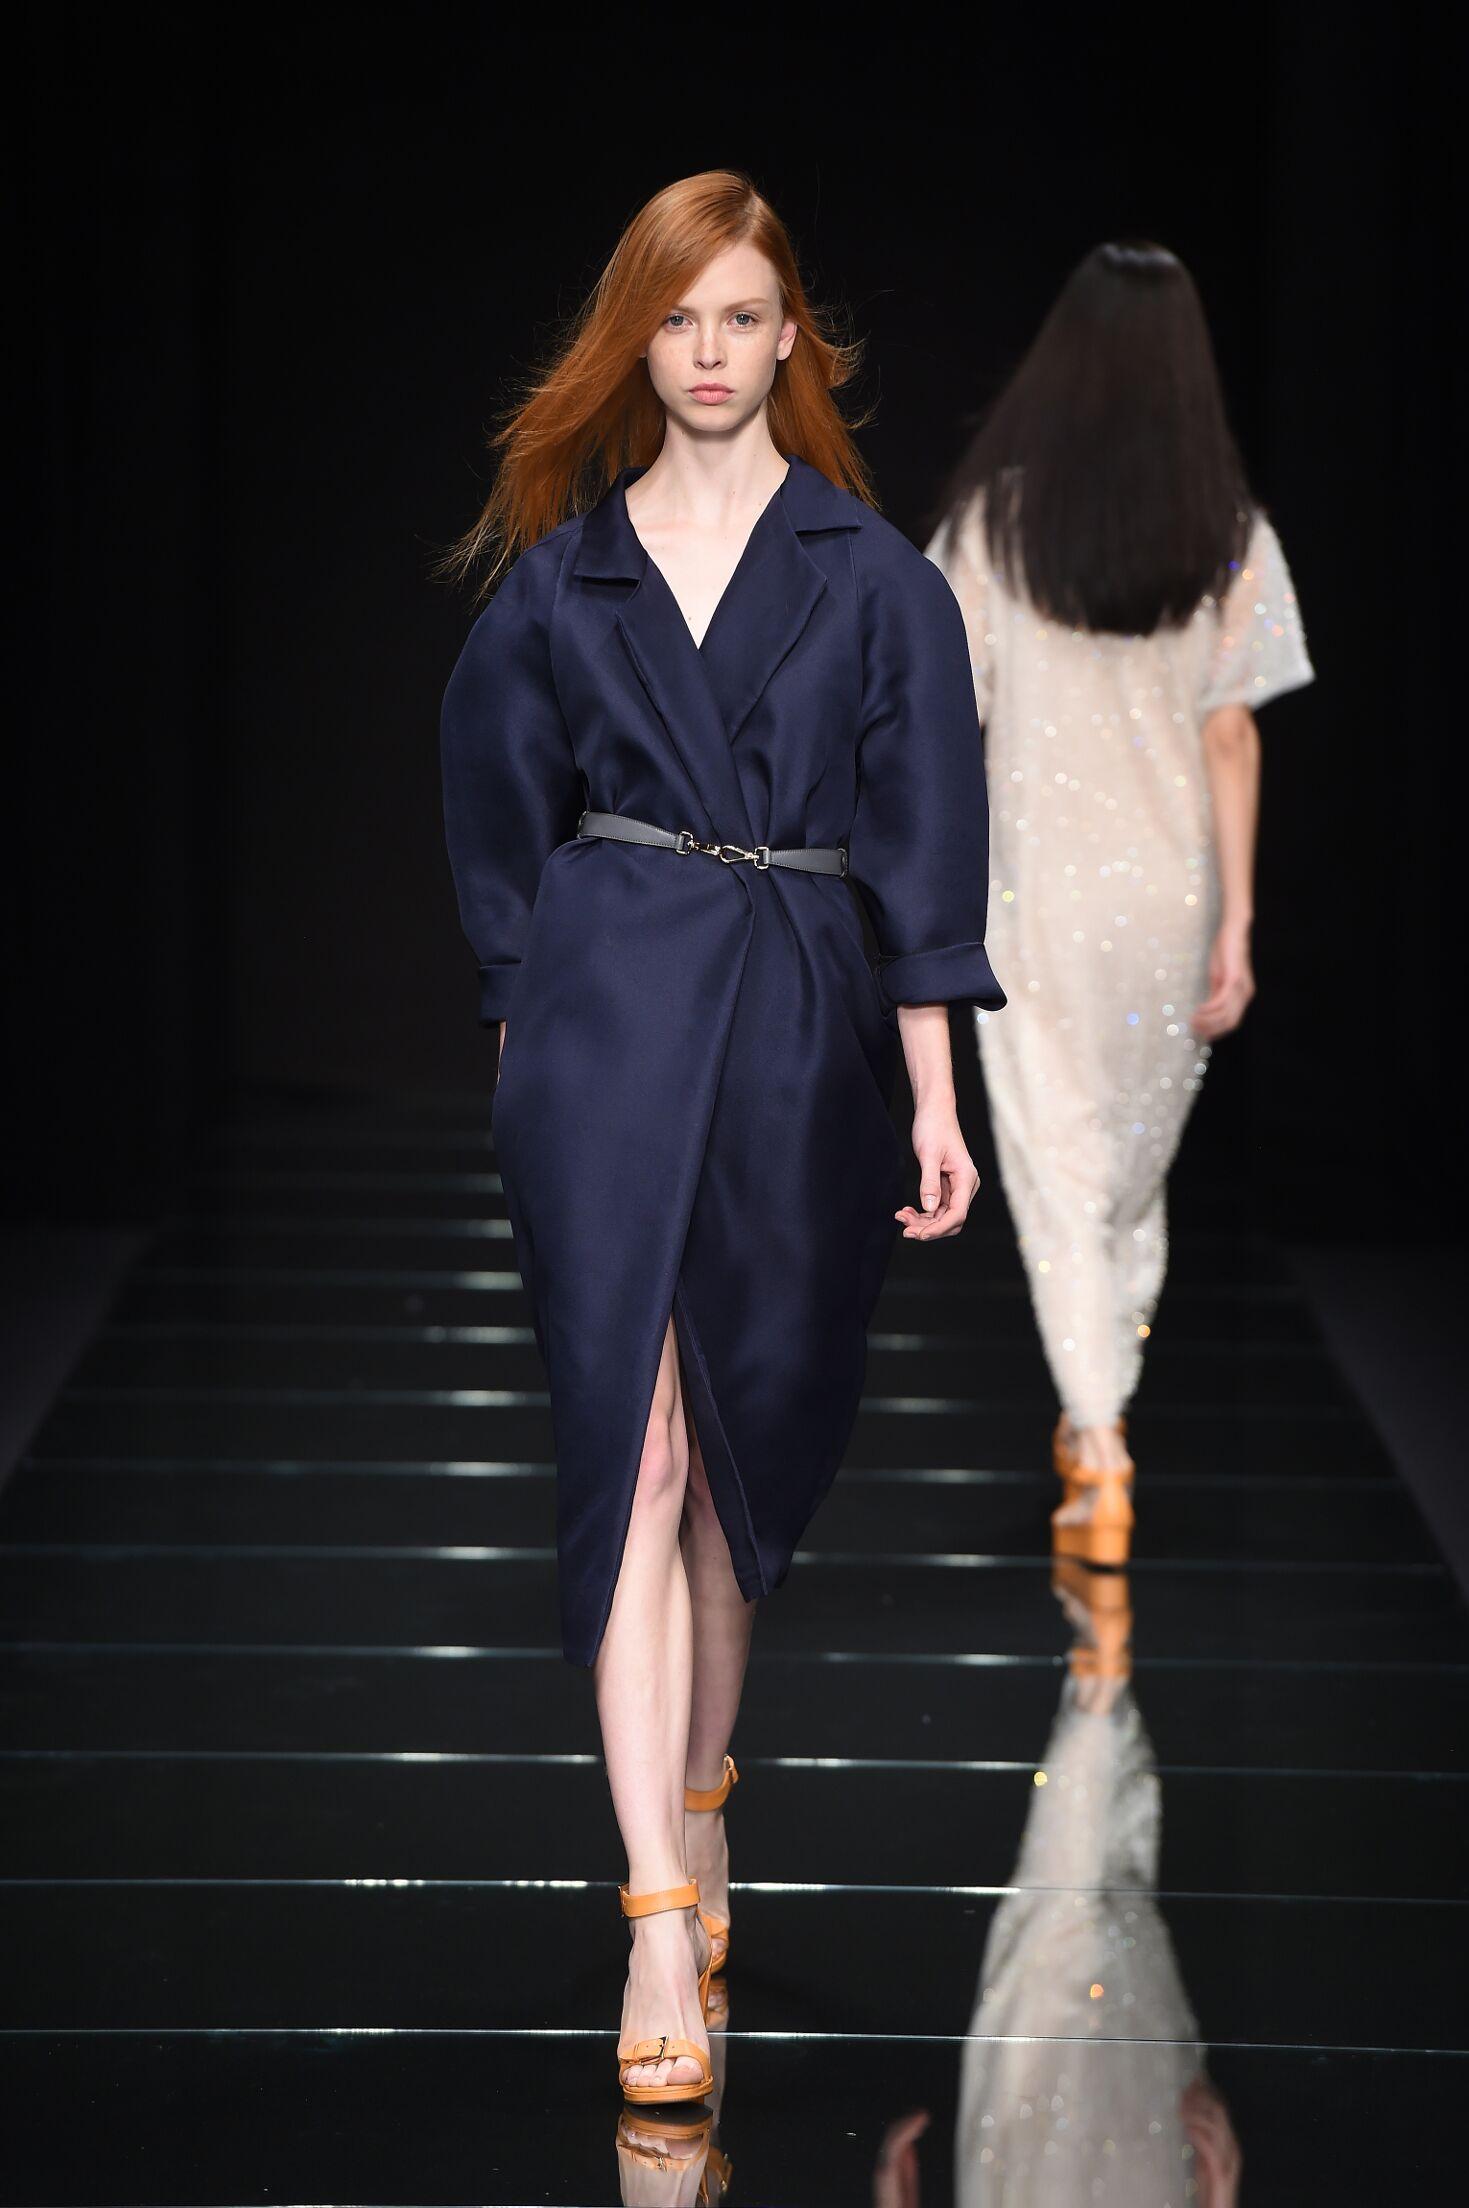 Spring Summer 2015 Fashion Model Anteprima